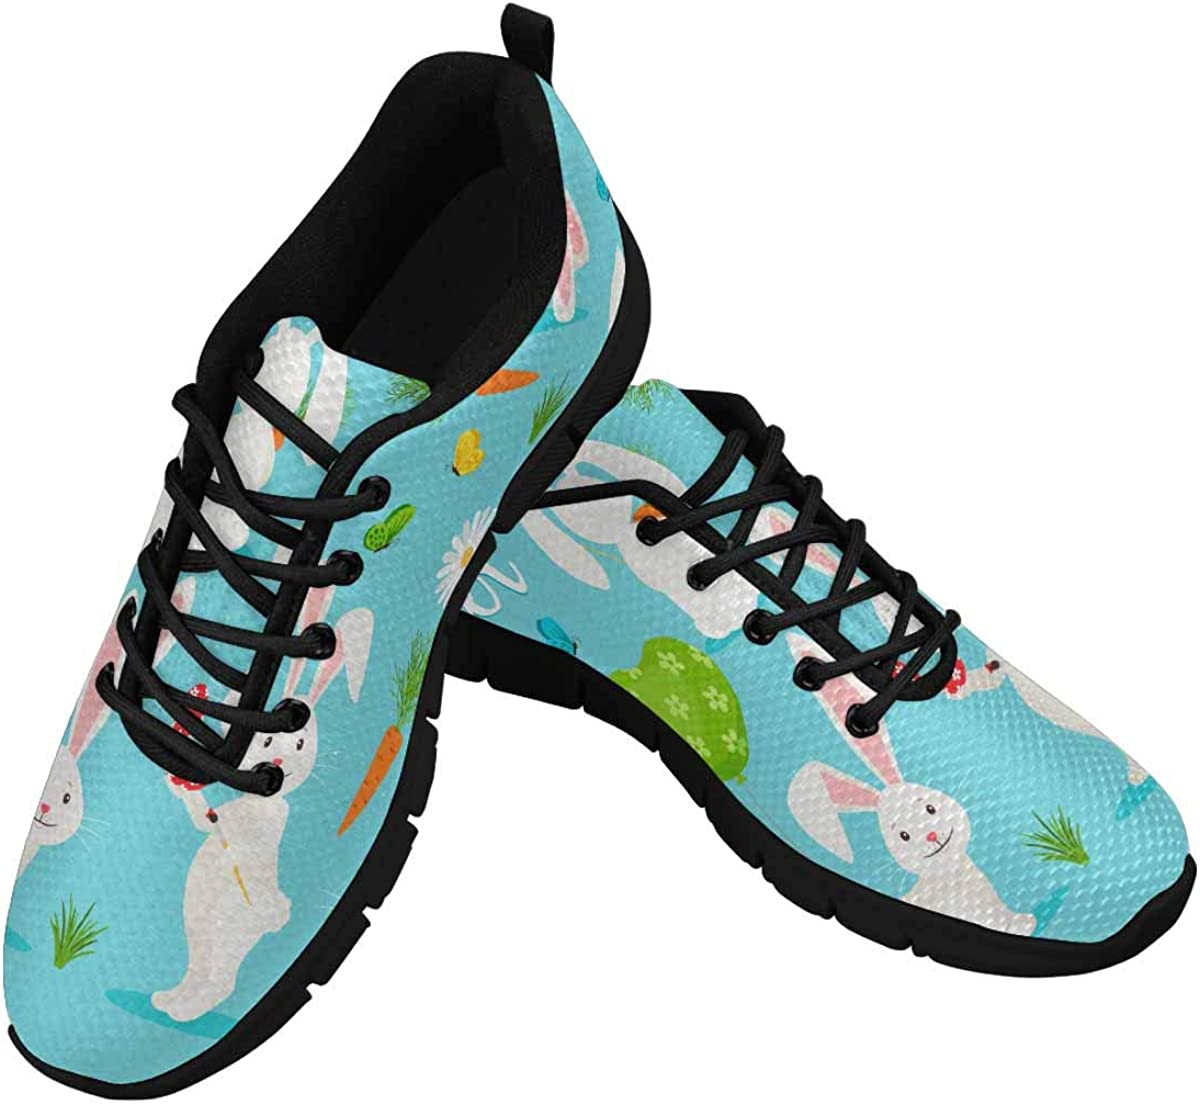 InterestPrint Happy Rabbit Eastern Bunny Women's Walking Shoes Lightweight Casual Running Sneakers